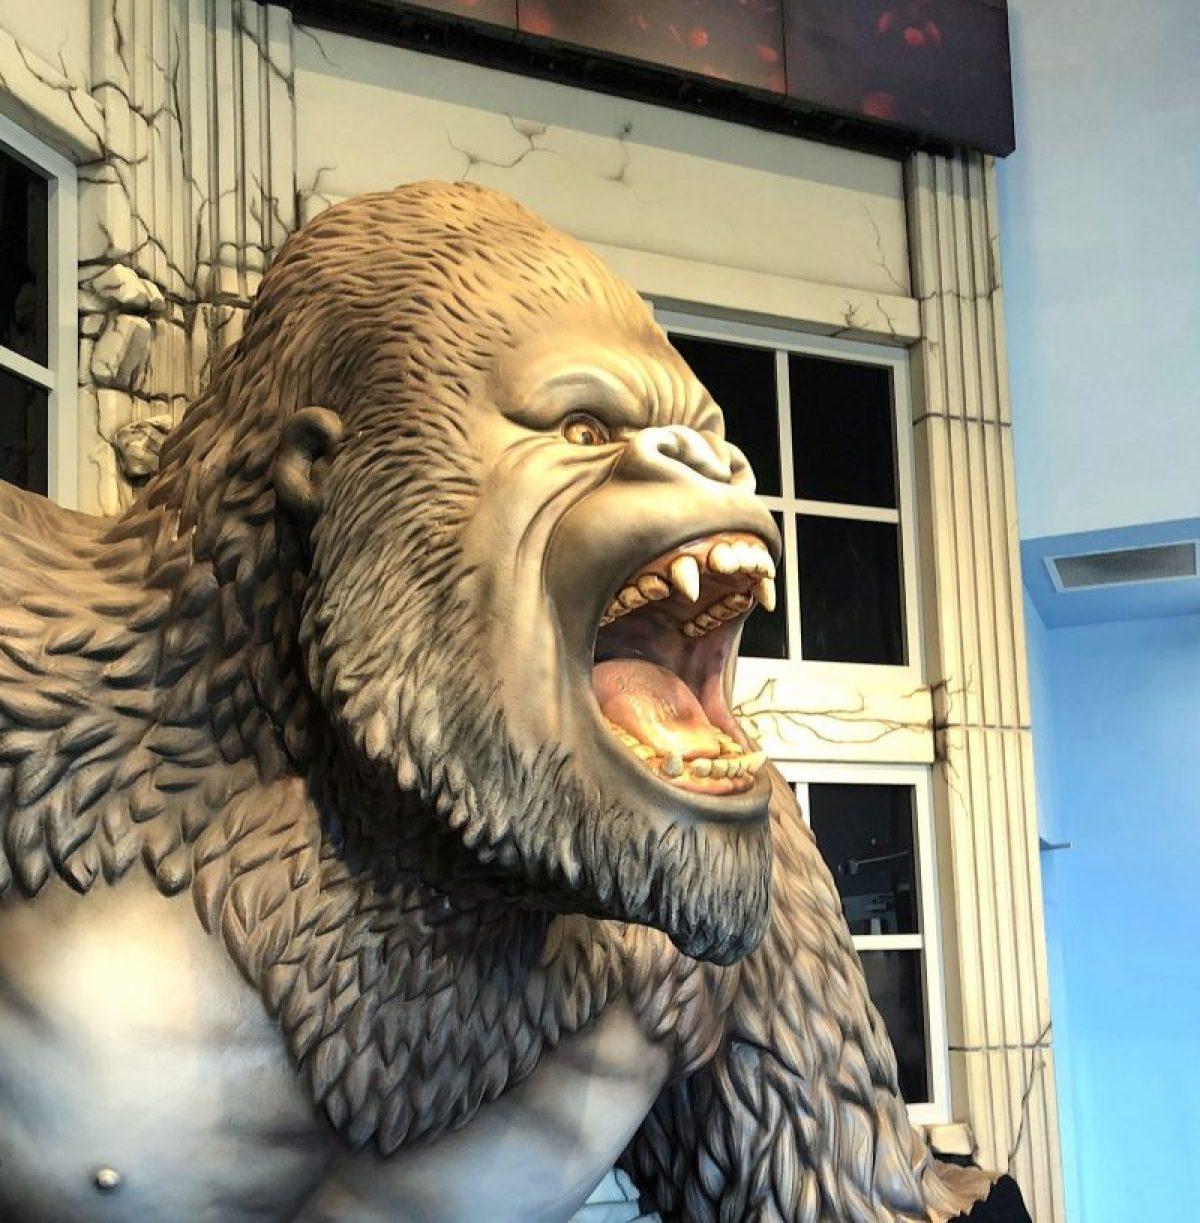 Gorilla Hollywood Wax Museum